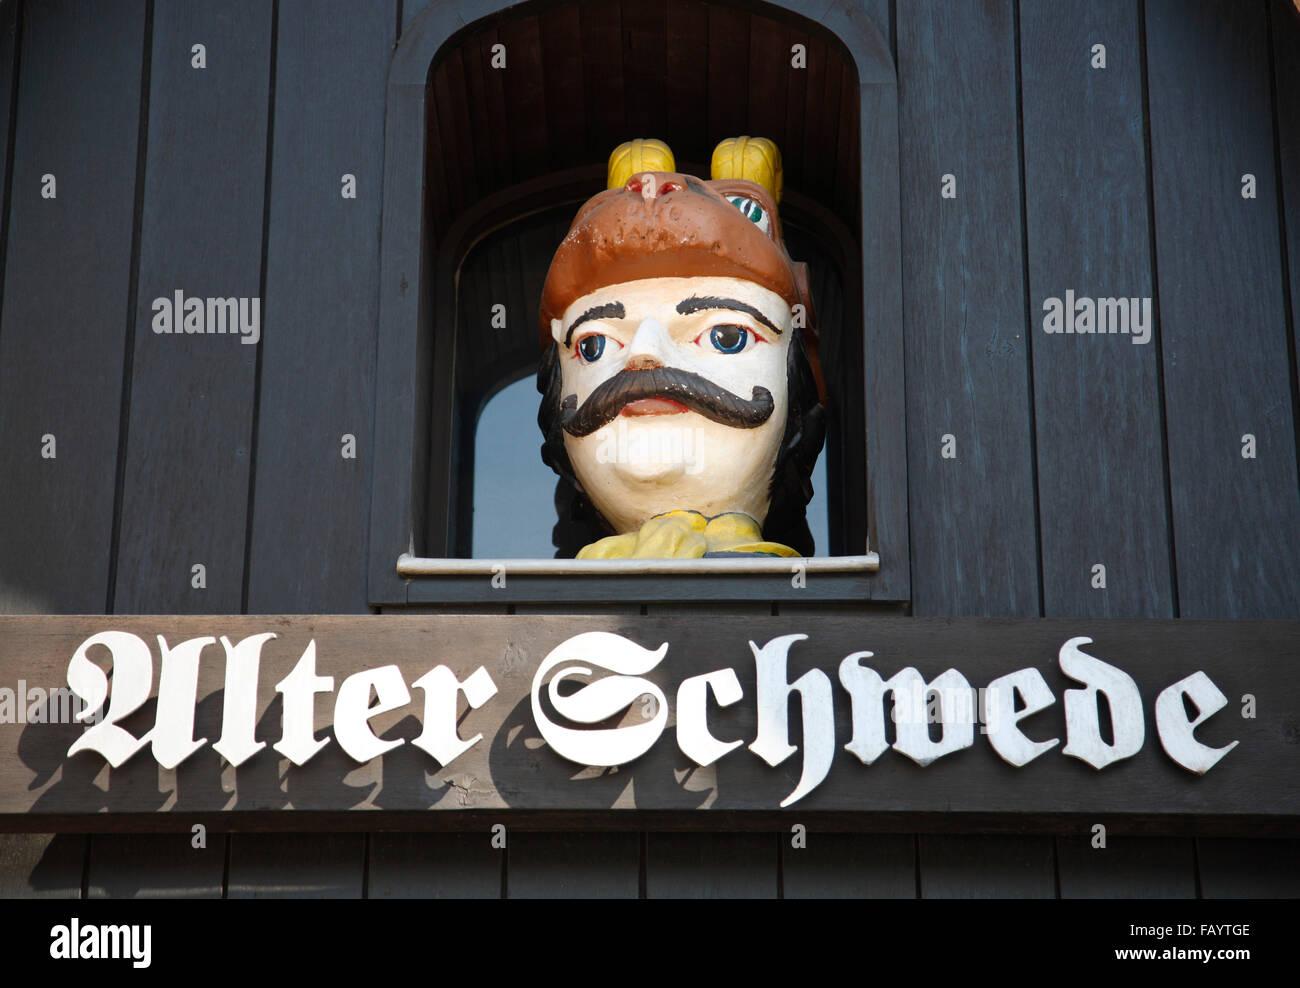 Restaurant ALTER SCHWEDE, Wismar, Baltic Sea, Mecklenburg Western Pomerania, Germany, Europe - Stock Image